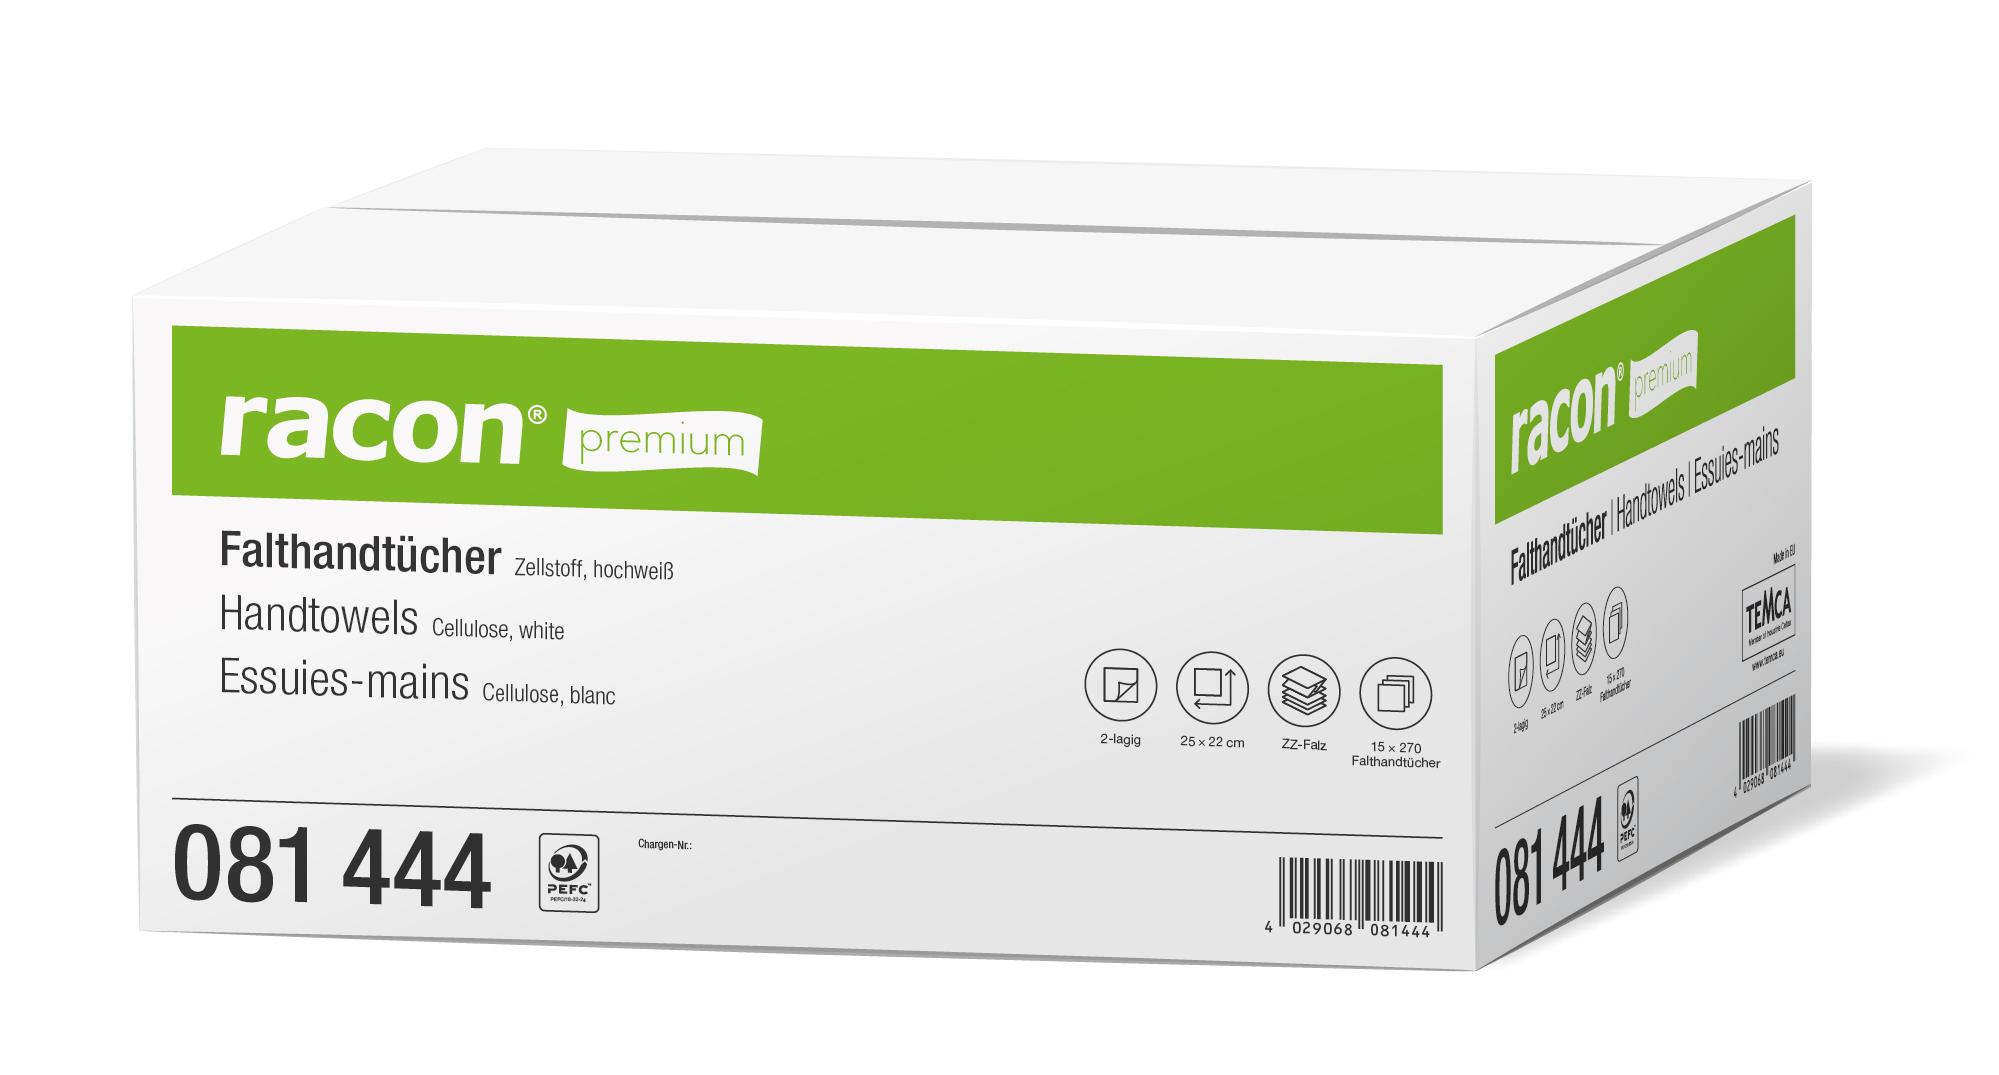 racon-premium-falthandtuecher-081444